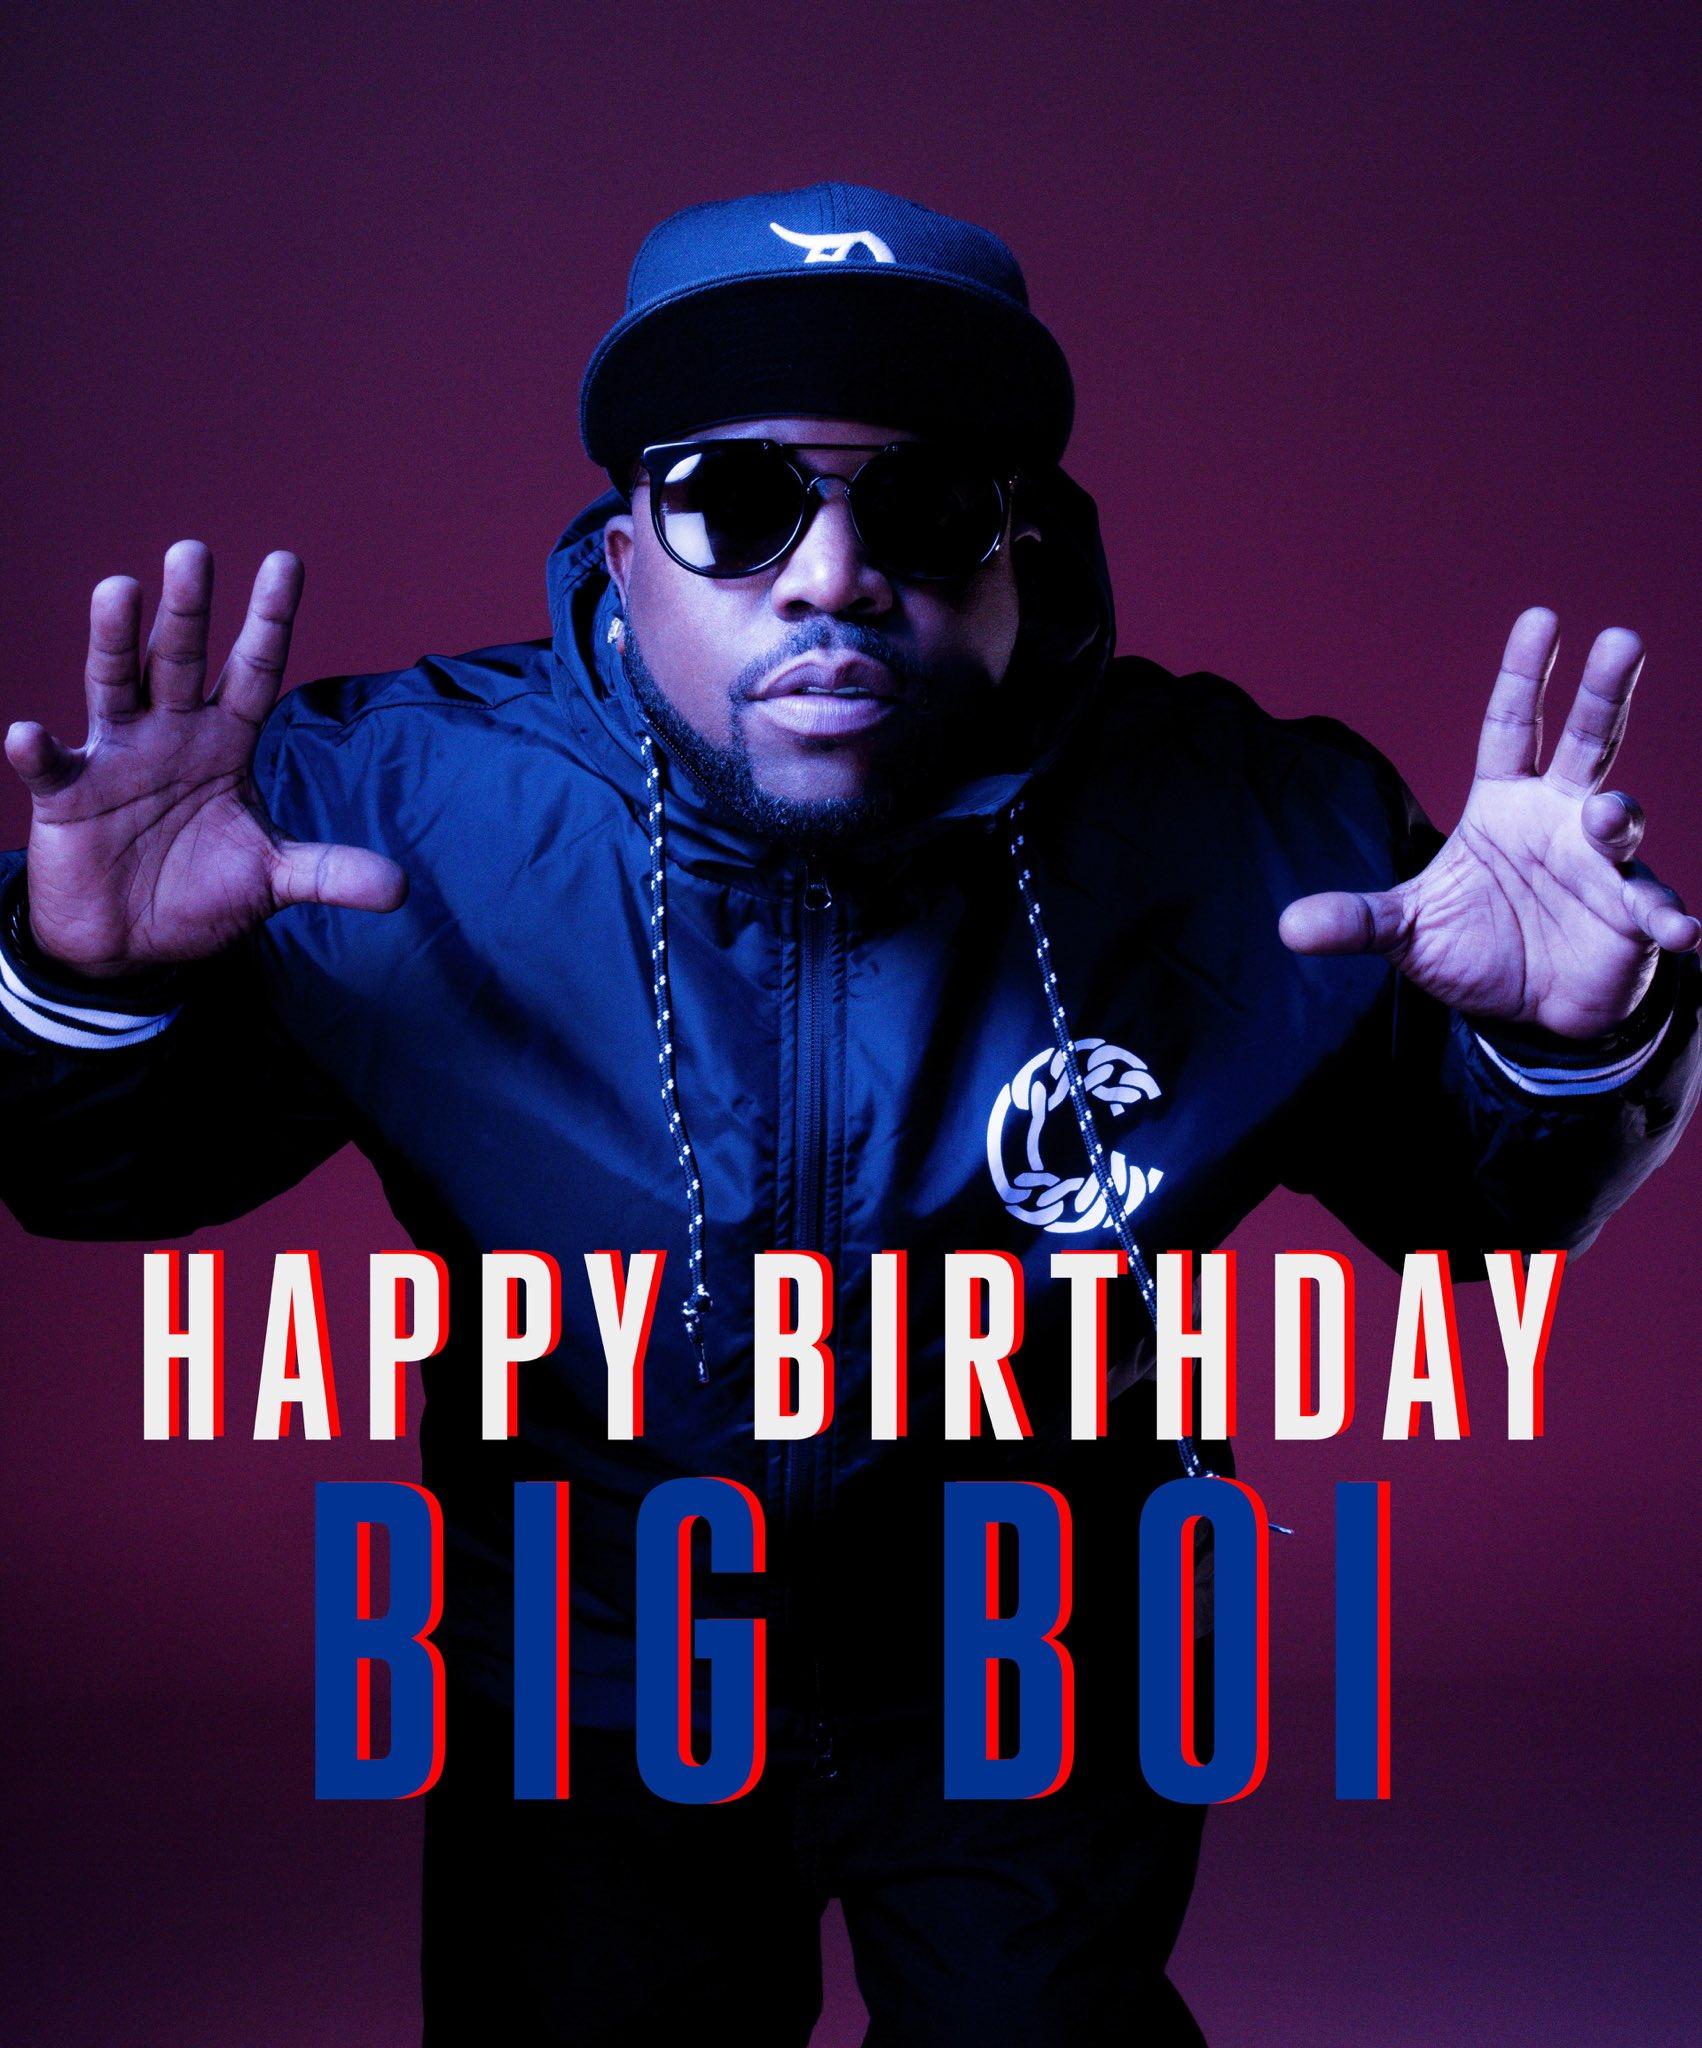 Happy Birthday @BigBoi‼️ #beEPIC ���� https://t.co/FSNGicKd95